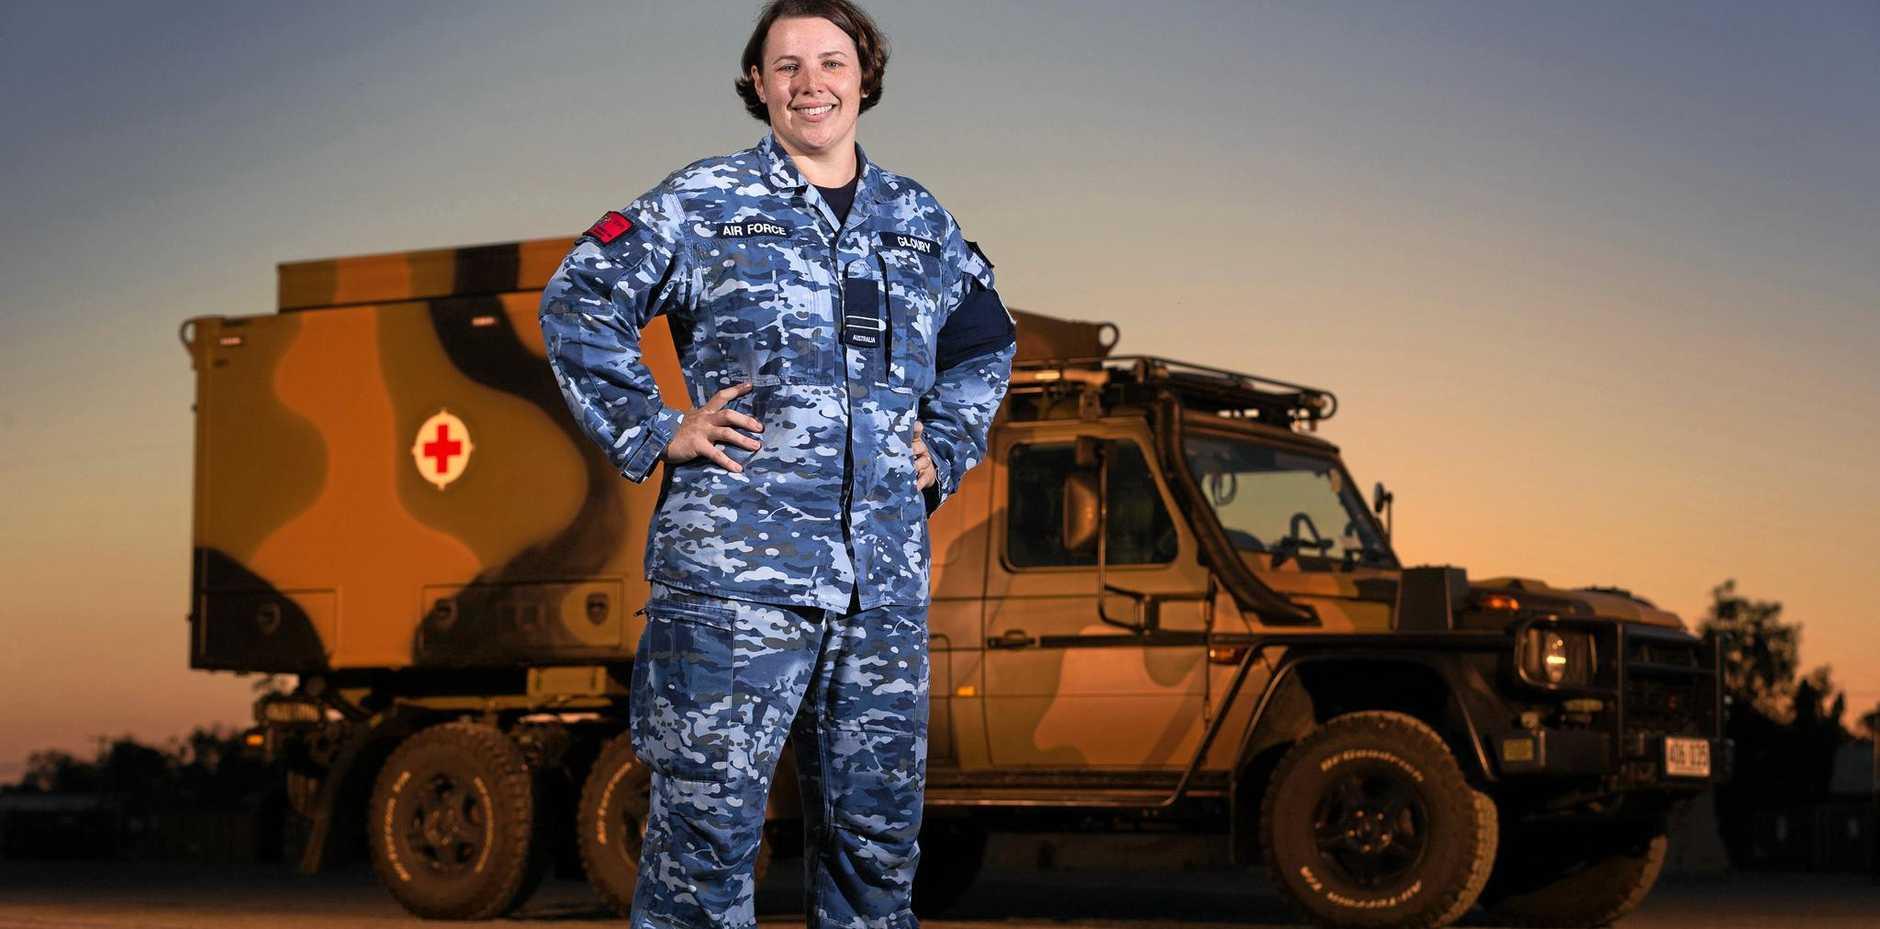 ROCKY DEPOLYMENT: RAAF Nursing Officer, Flight Lieutenant Amanda Gloury with a Mercedes G-Wagon ambulance outside the Role 2 Health Facility at Rockhampton during Exercise Talisman Saber 2017.